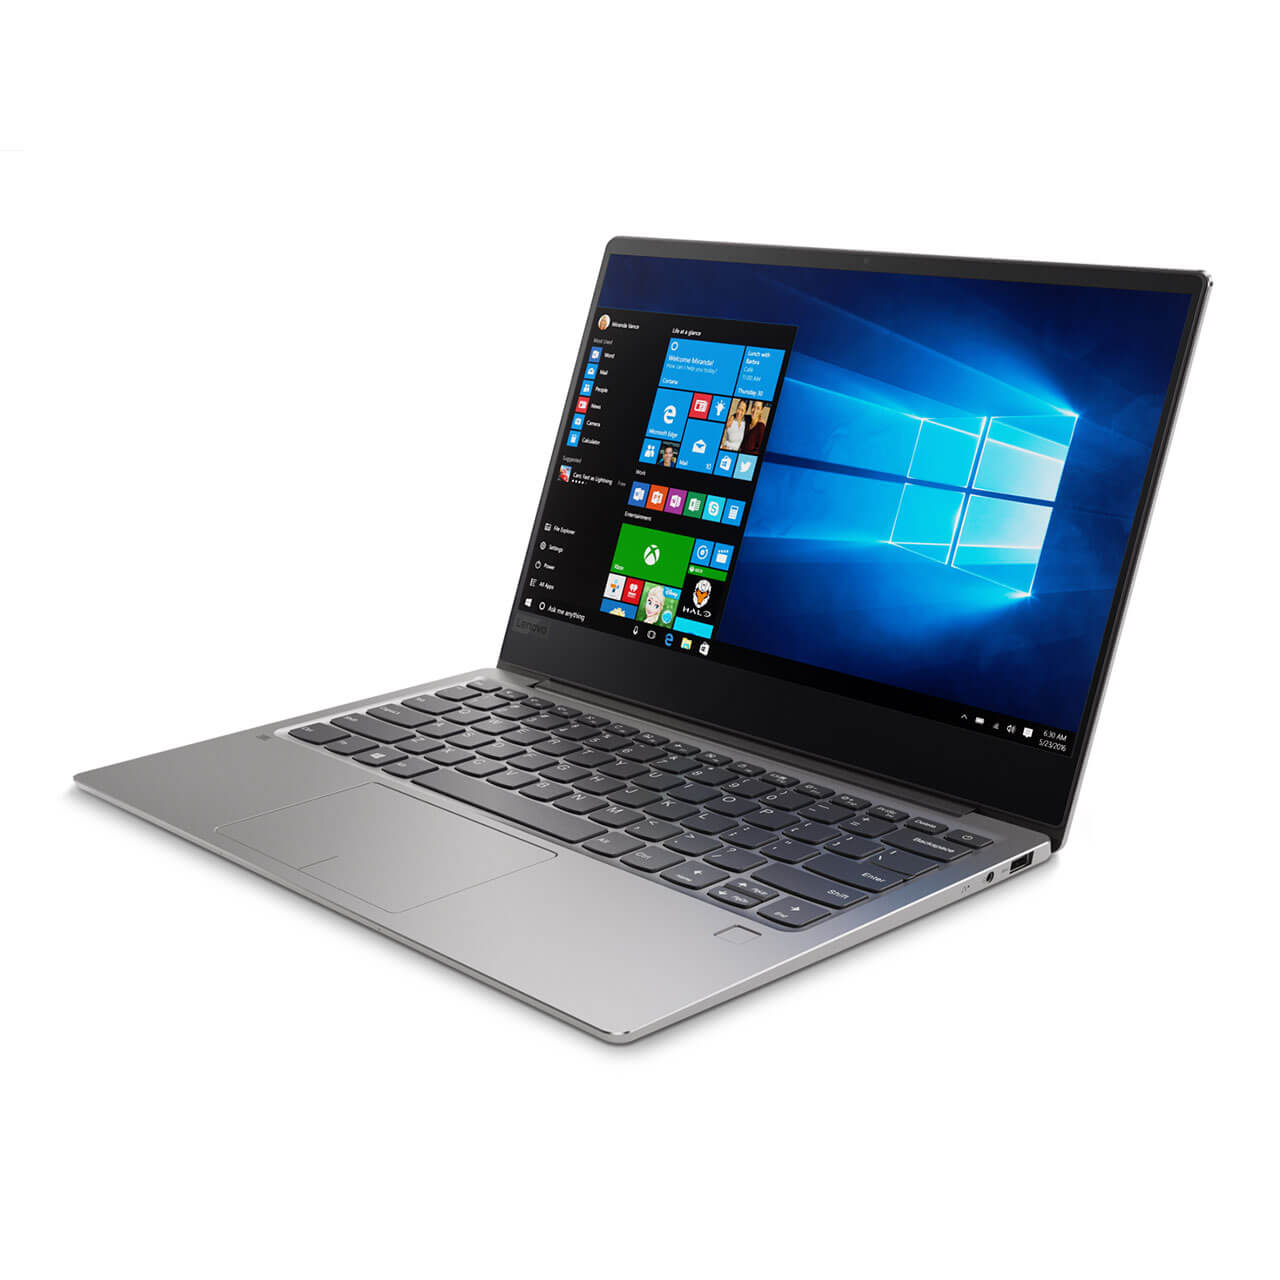 "Lenovo Ideapad 720s, 13.3"", AMD Ryzen™ 5 2500U , 8.0GB DDR4 RAM, 256GB SSD, Win 10 Home 64 1"